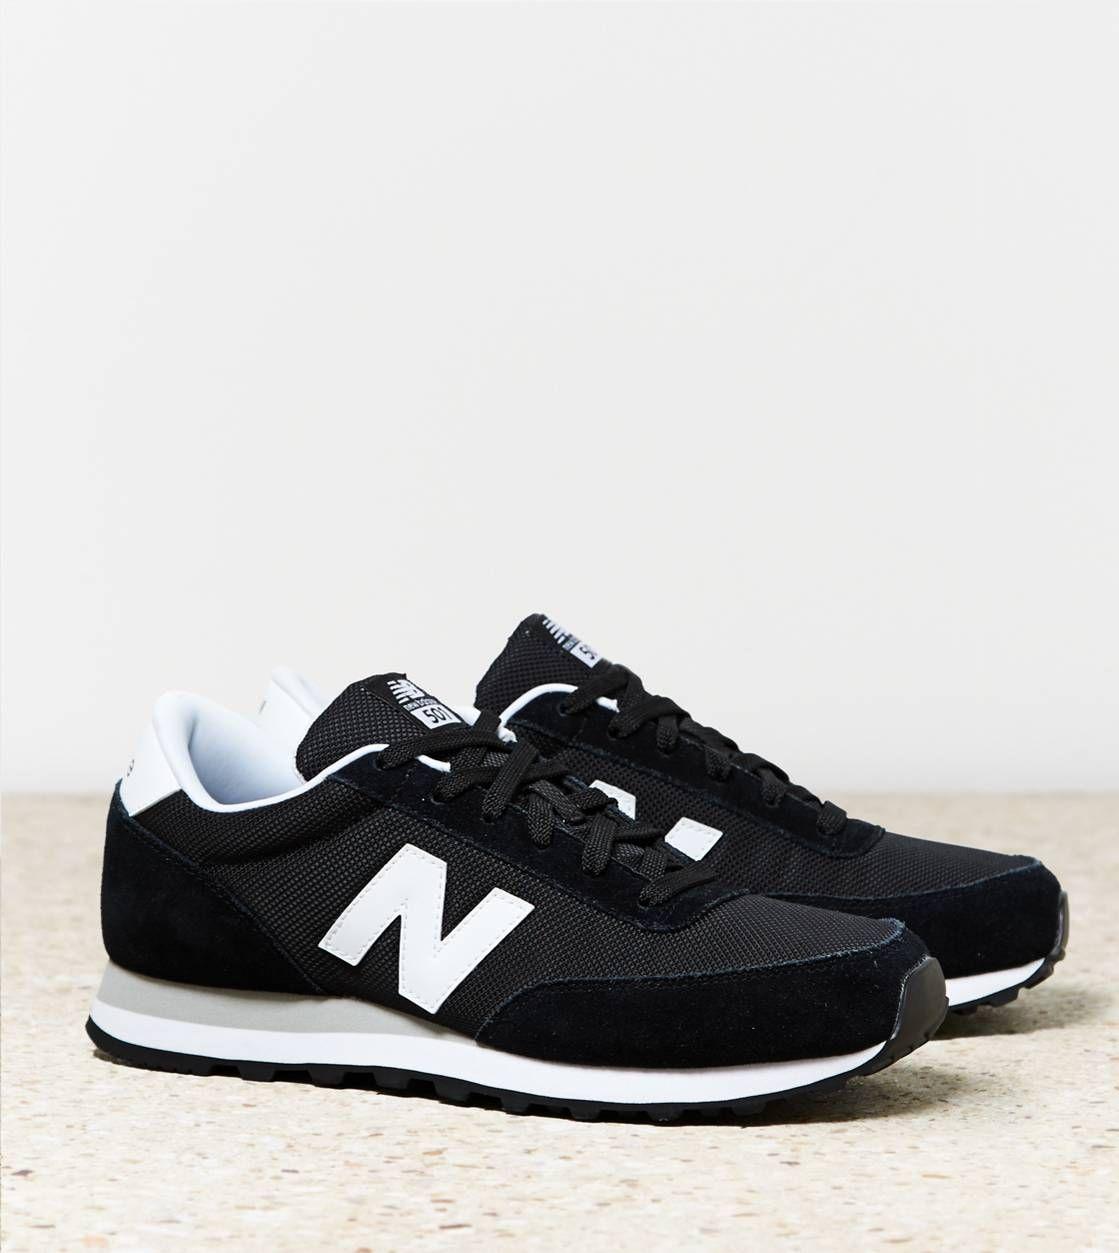 Black New Balance 501 Sneaker Trendy Womens Sneakers Womens Sneakers Cute Shoes